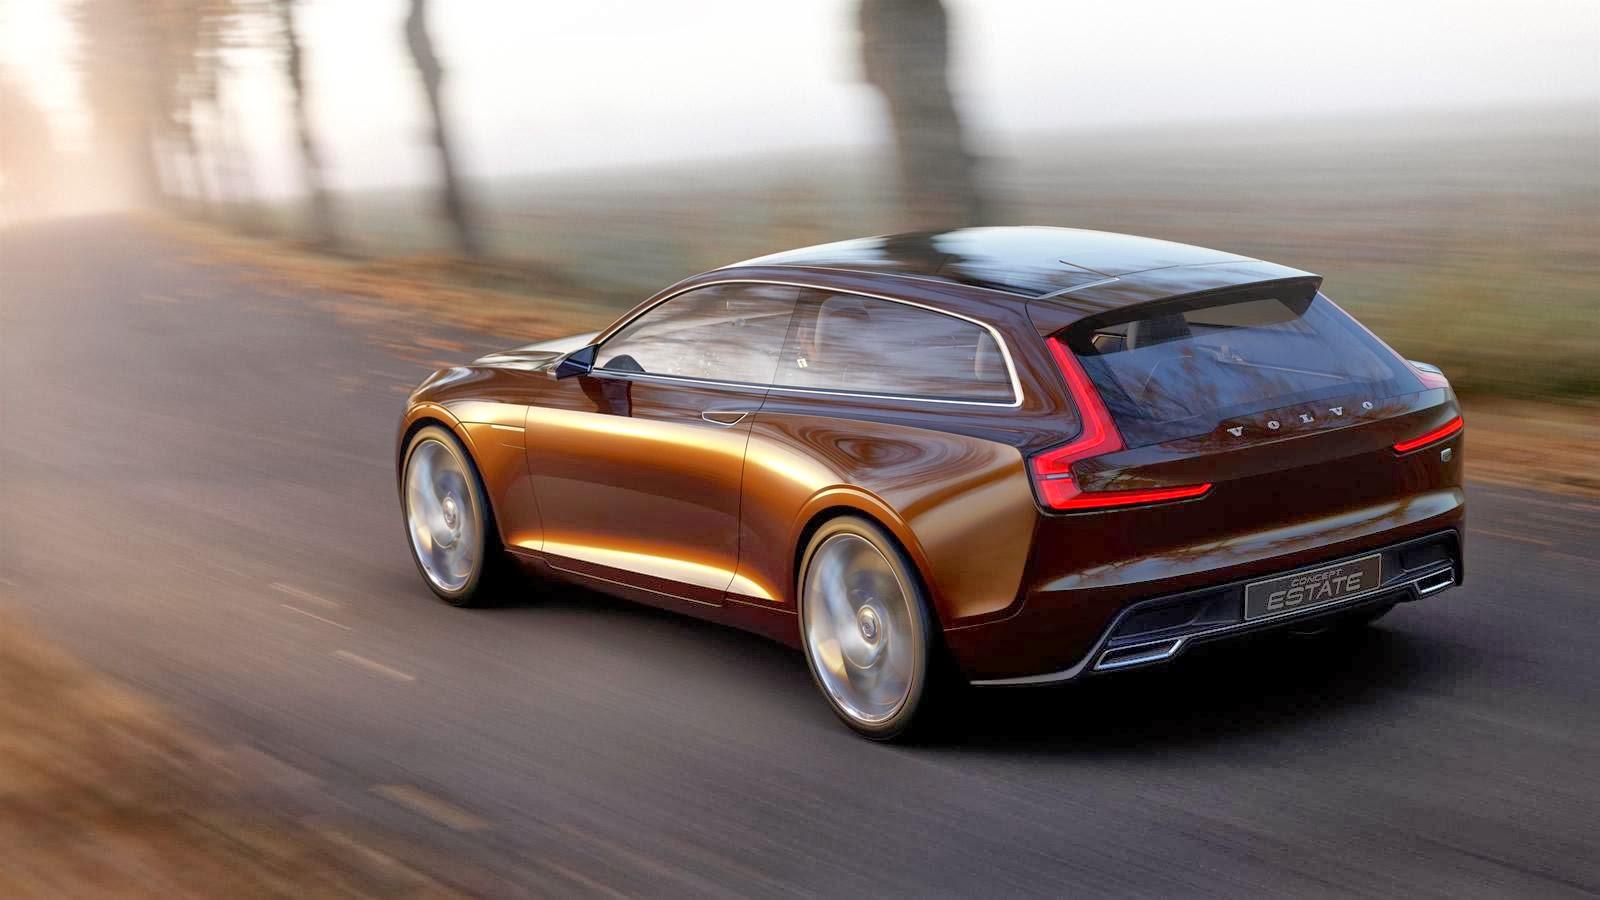 [Resim: Volvo+Concept+Estate+2.jpg]